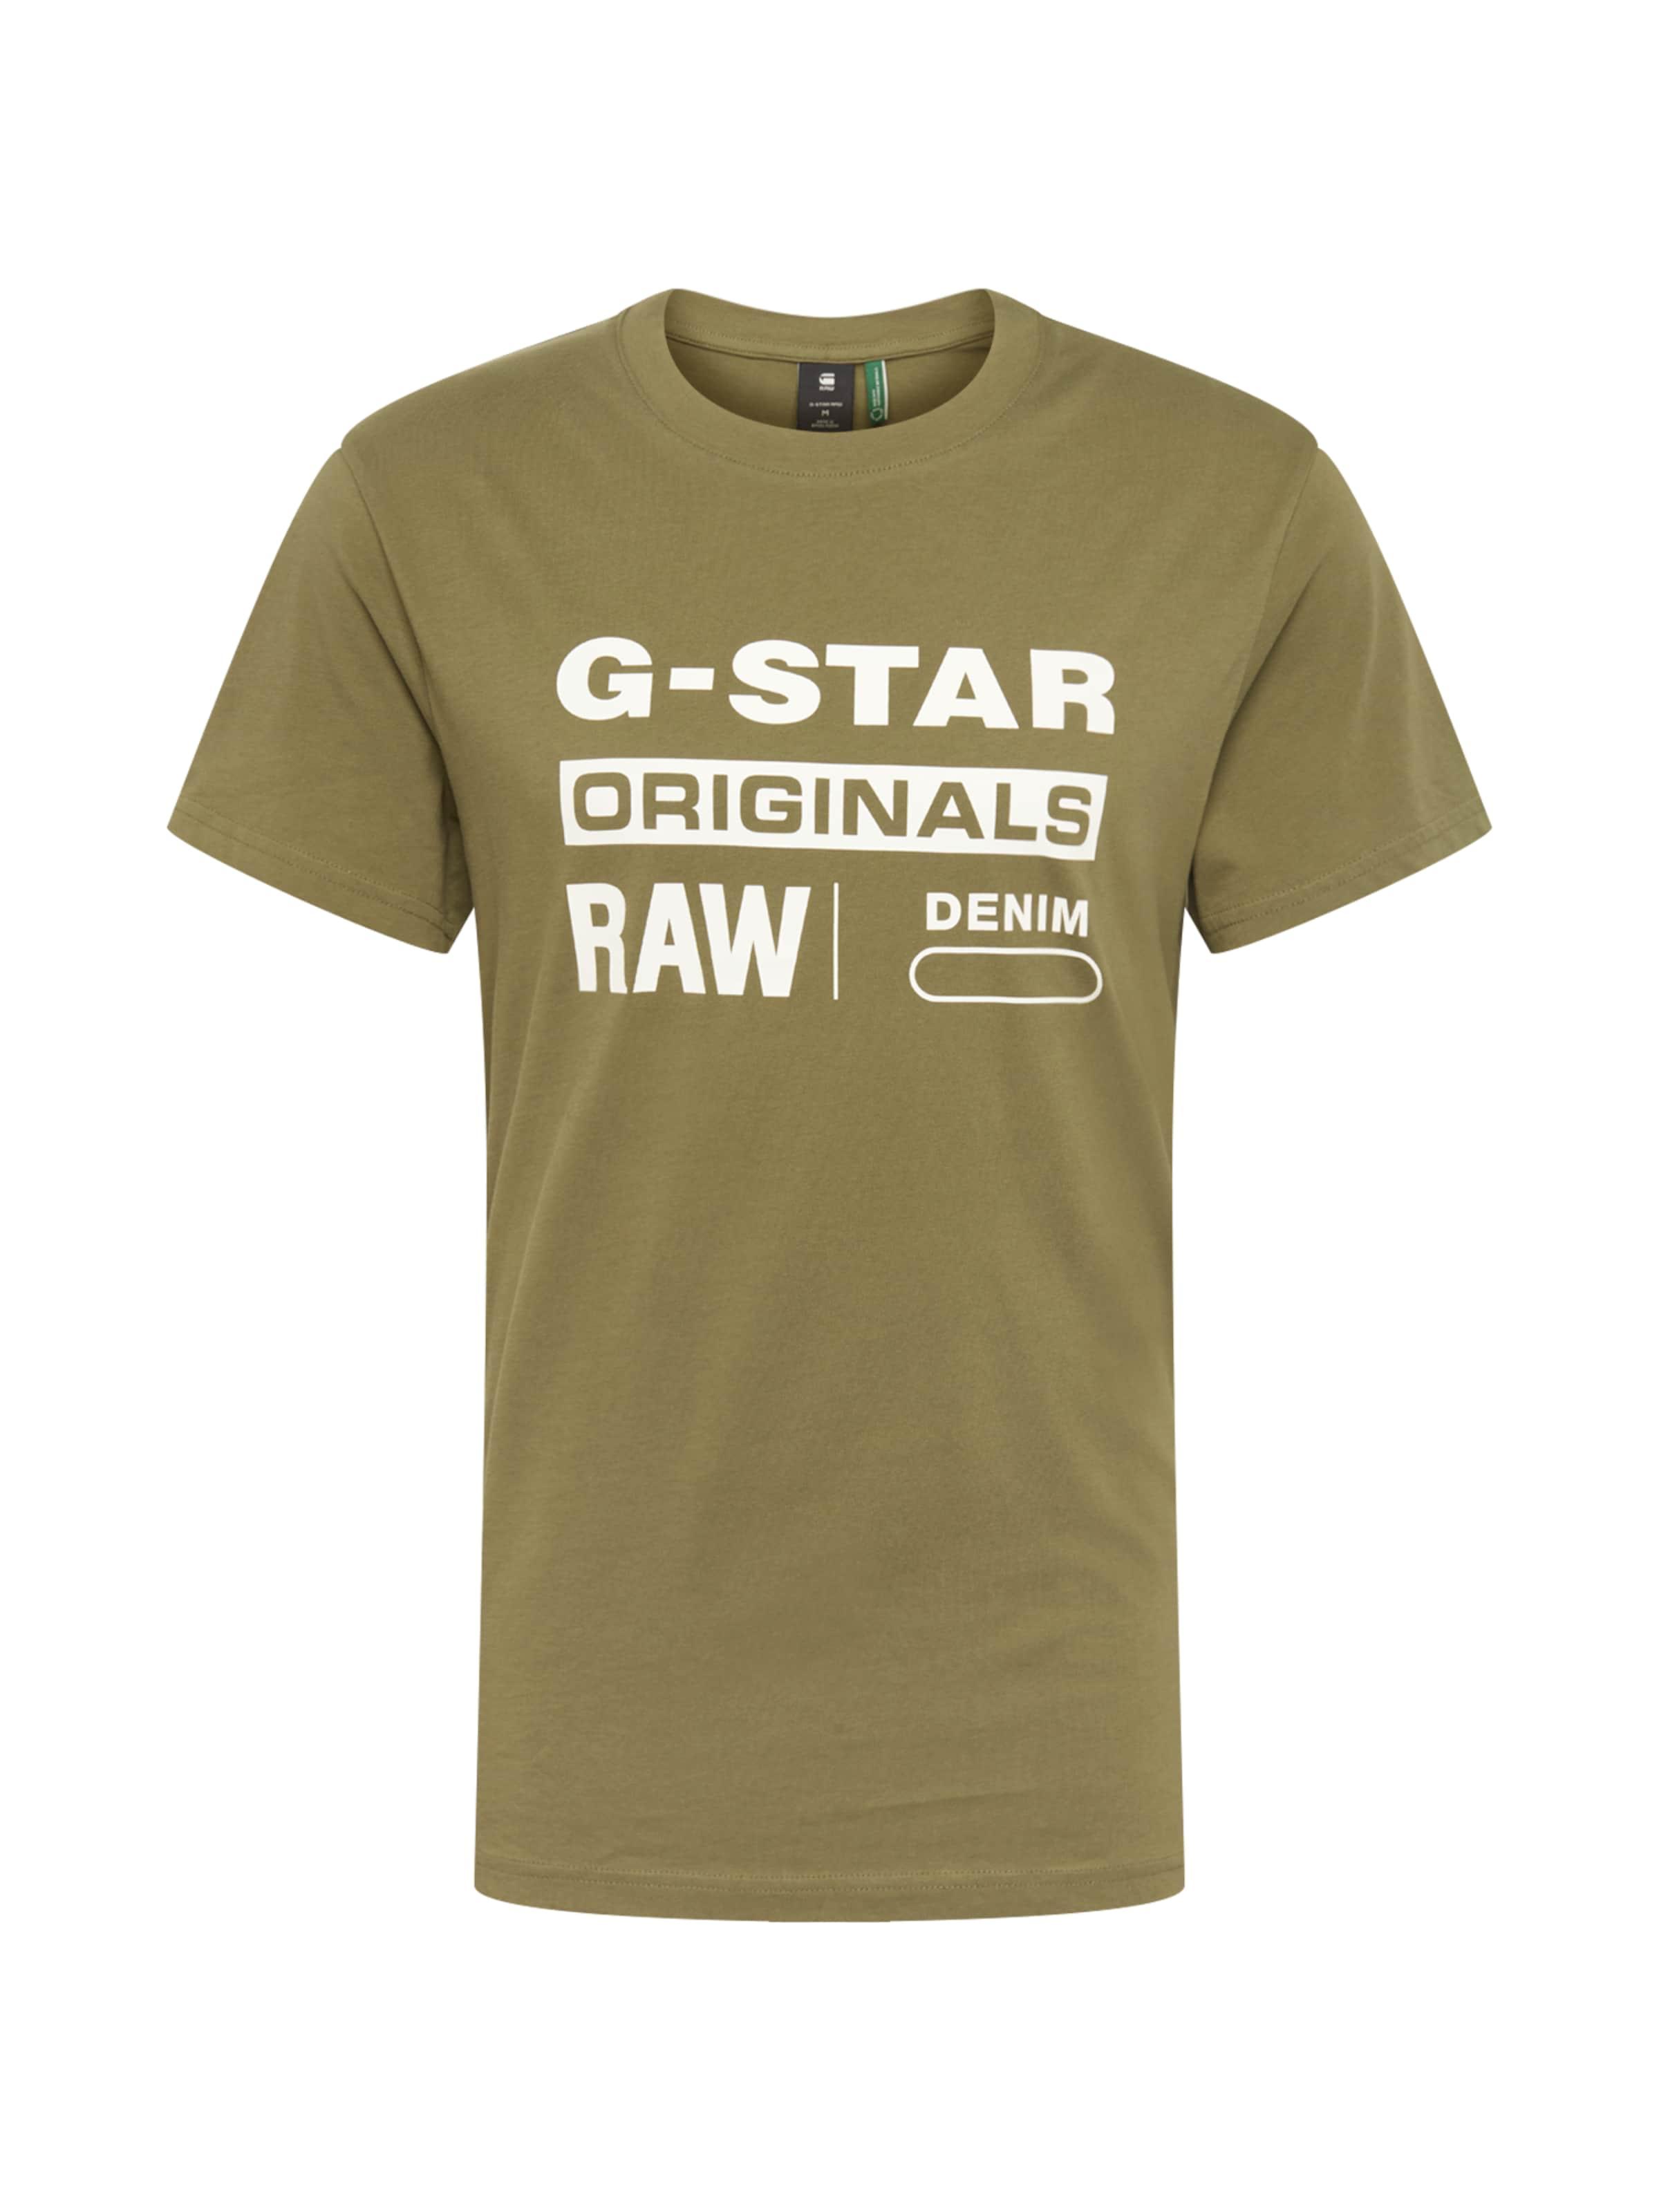 8' KakiBlanc Raw En T 'graphic star G shirt dhQxrsCBt